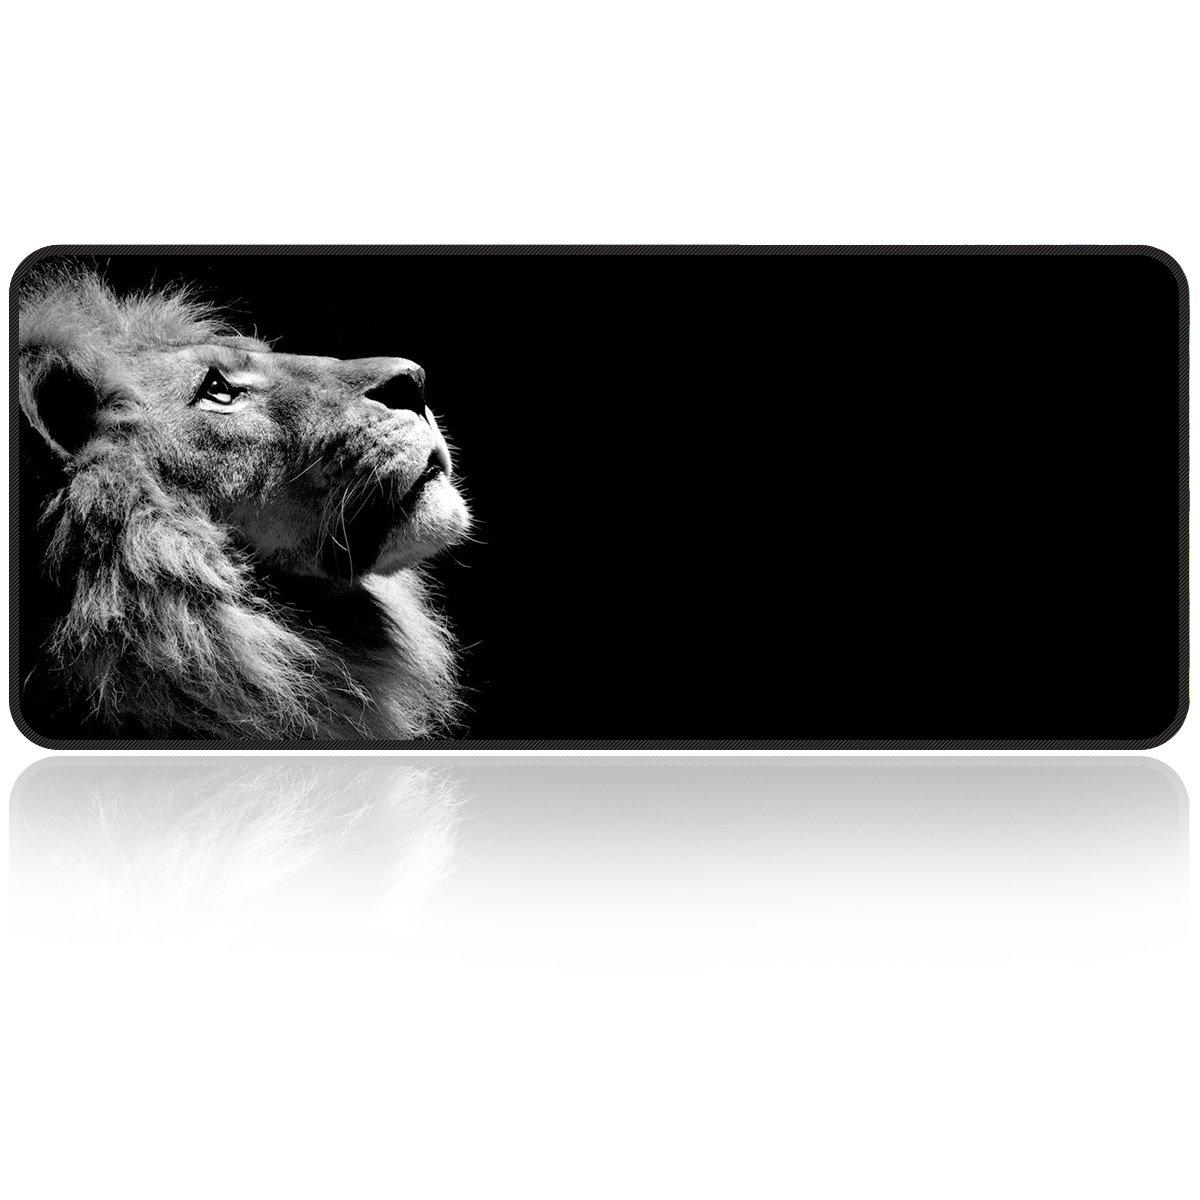 Mouse pad gigante 80 cm x 30 cm con base antidelizante (xmp)